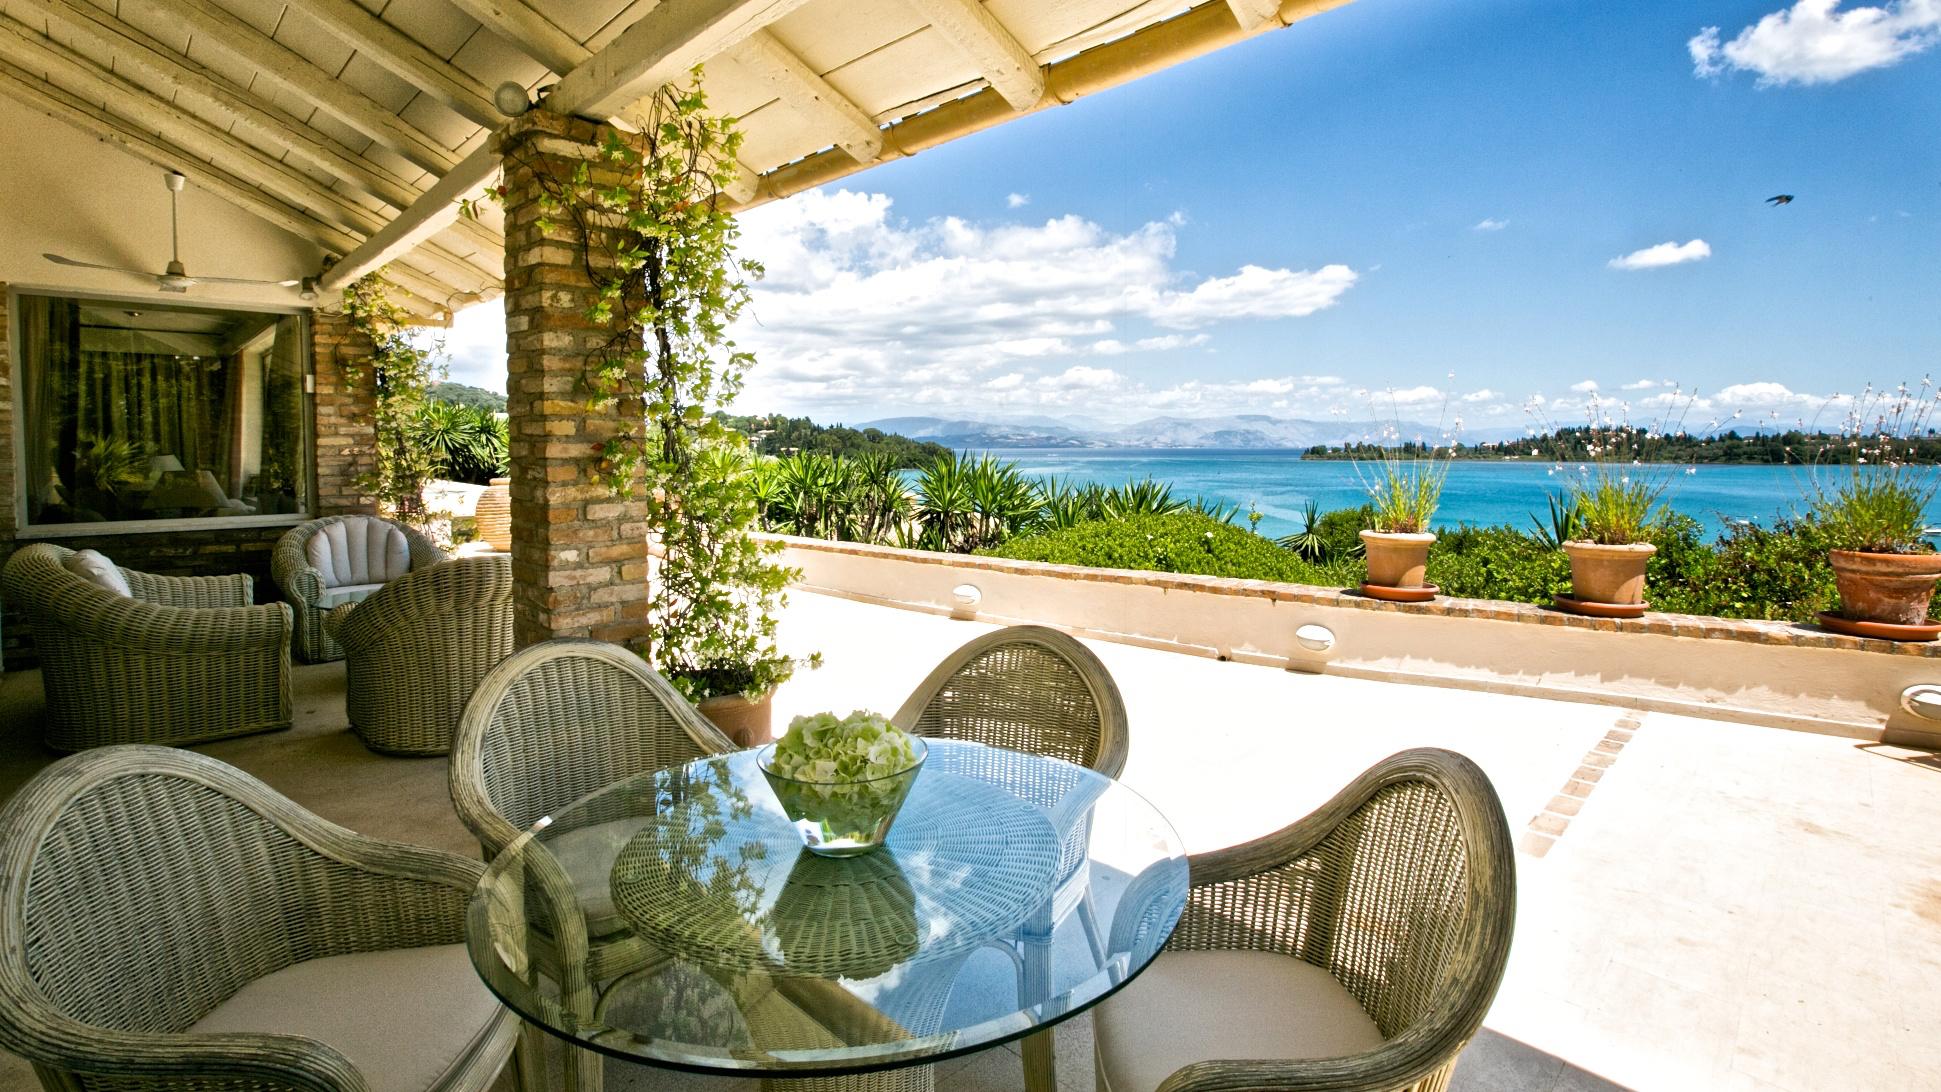 Single Family Home for Sale at Utopia Corfu, Ionian Islands, Greece